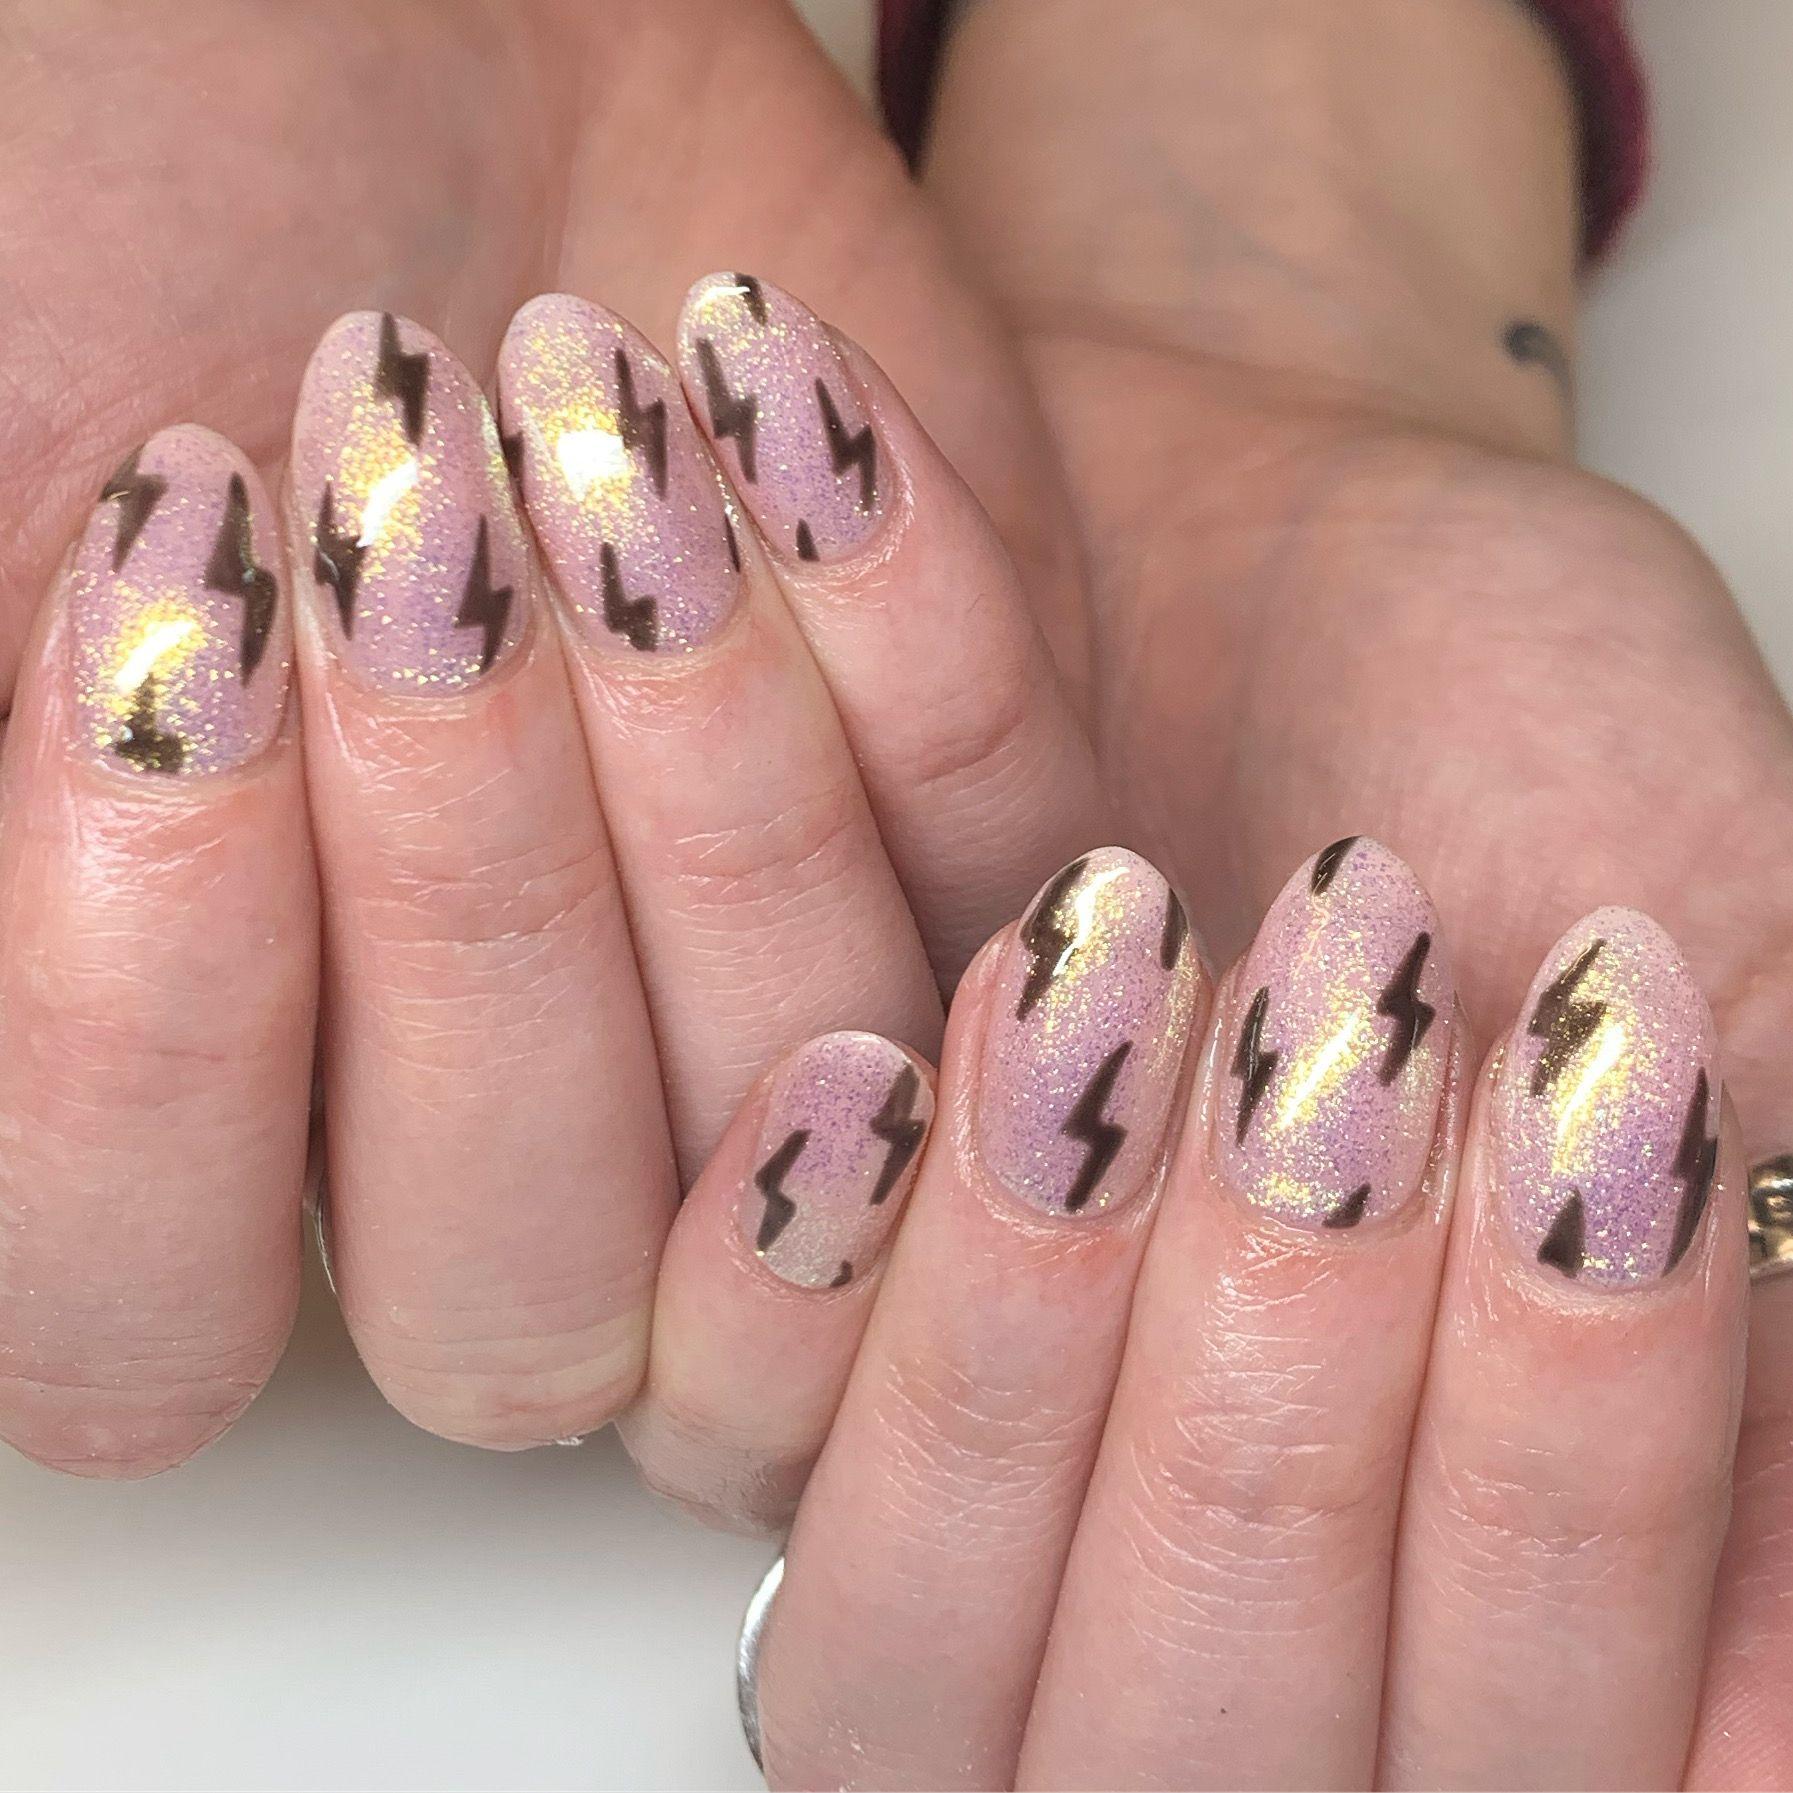 Nail Art Design Ideas To Give You Amazing Fall This Year Lavender Nails Cute Acrylic Nails Nail Shapes